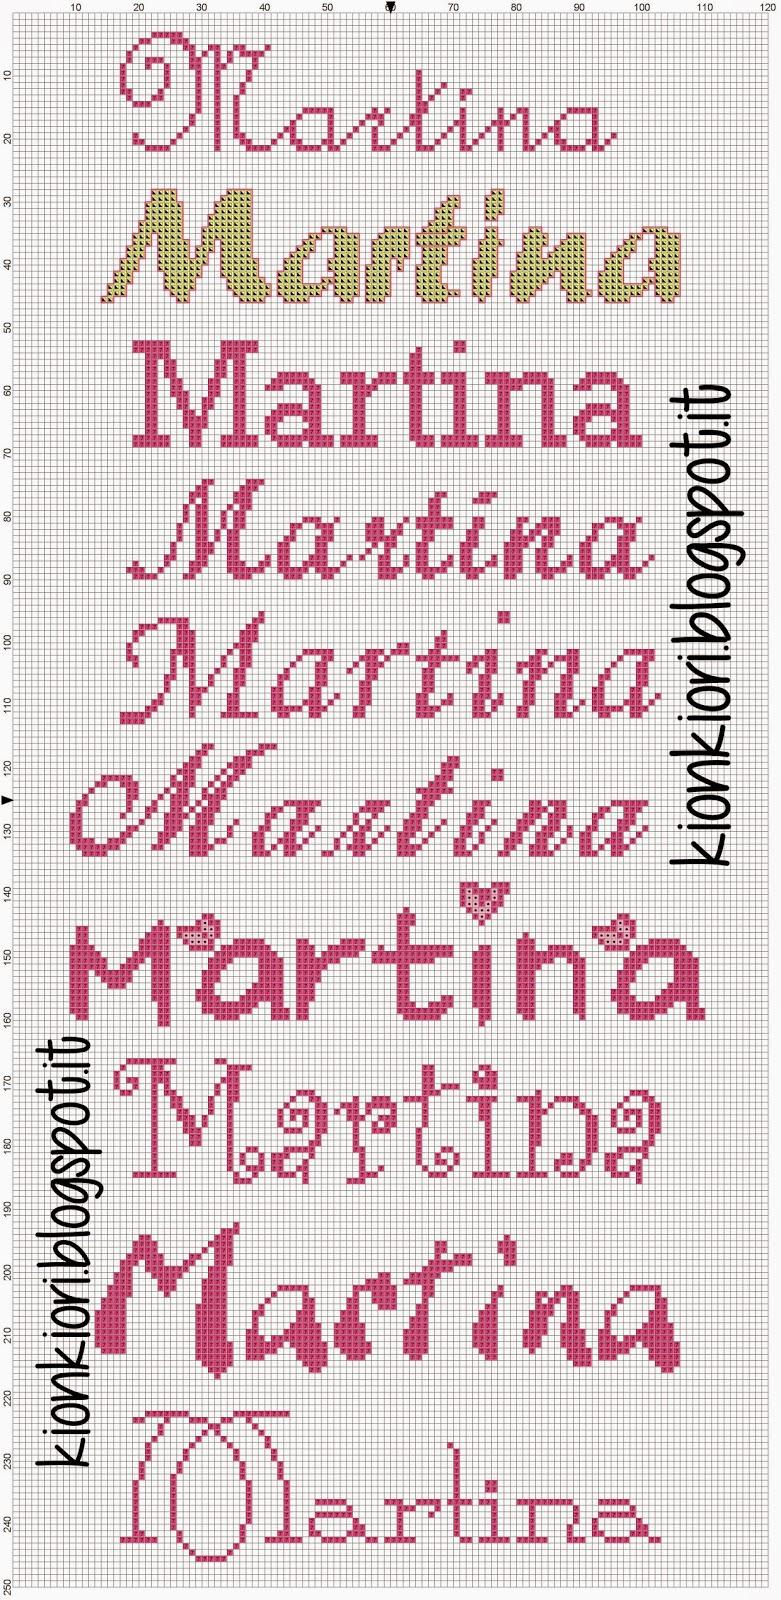 Conosciuto KIONKIORI Punto Croce: Agata, Hélène Marie, Martina e Mariano QP09